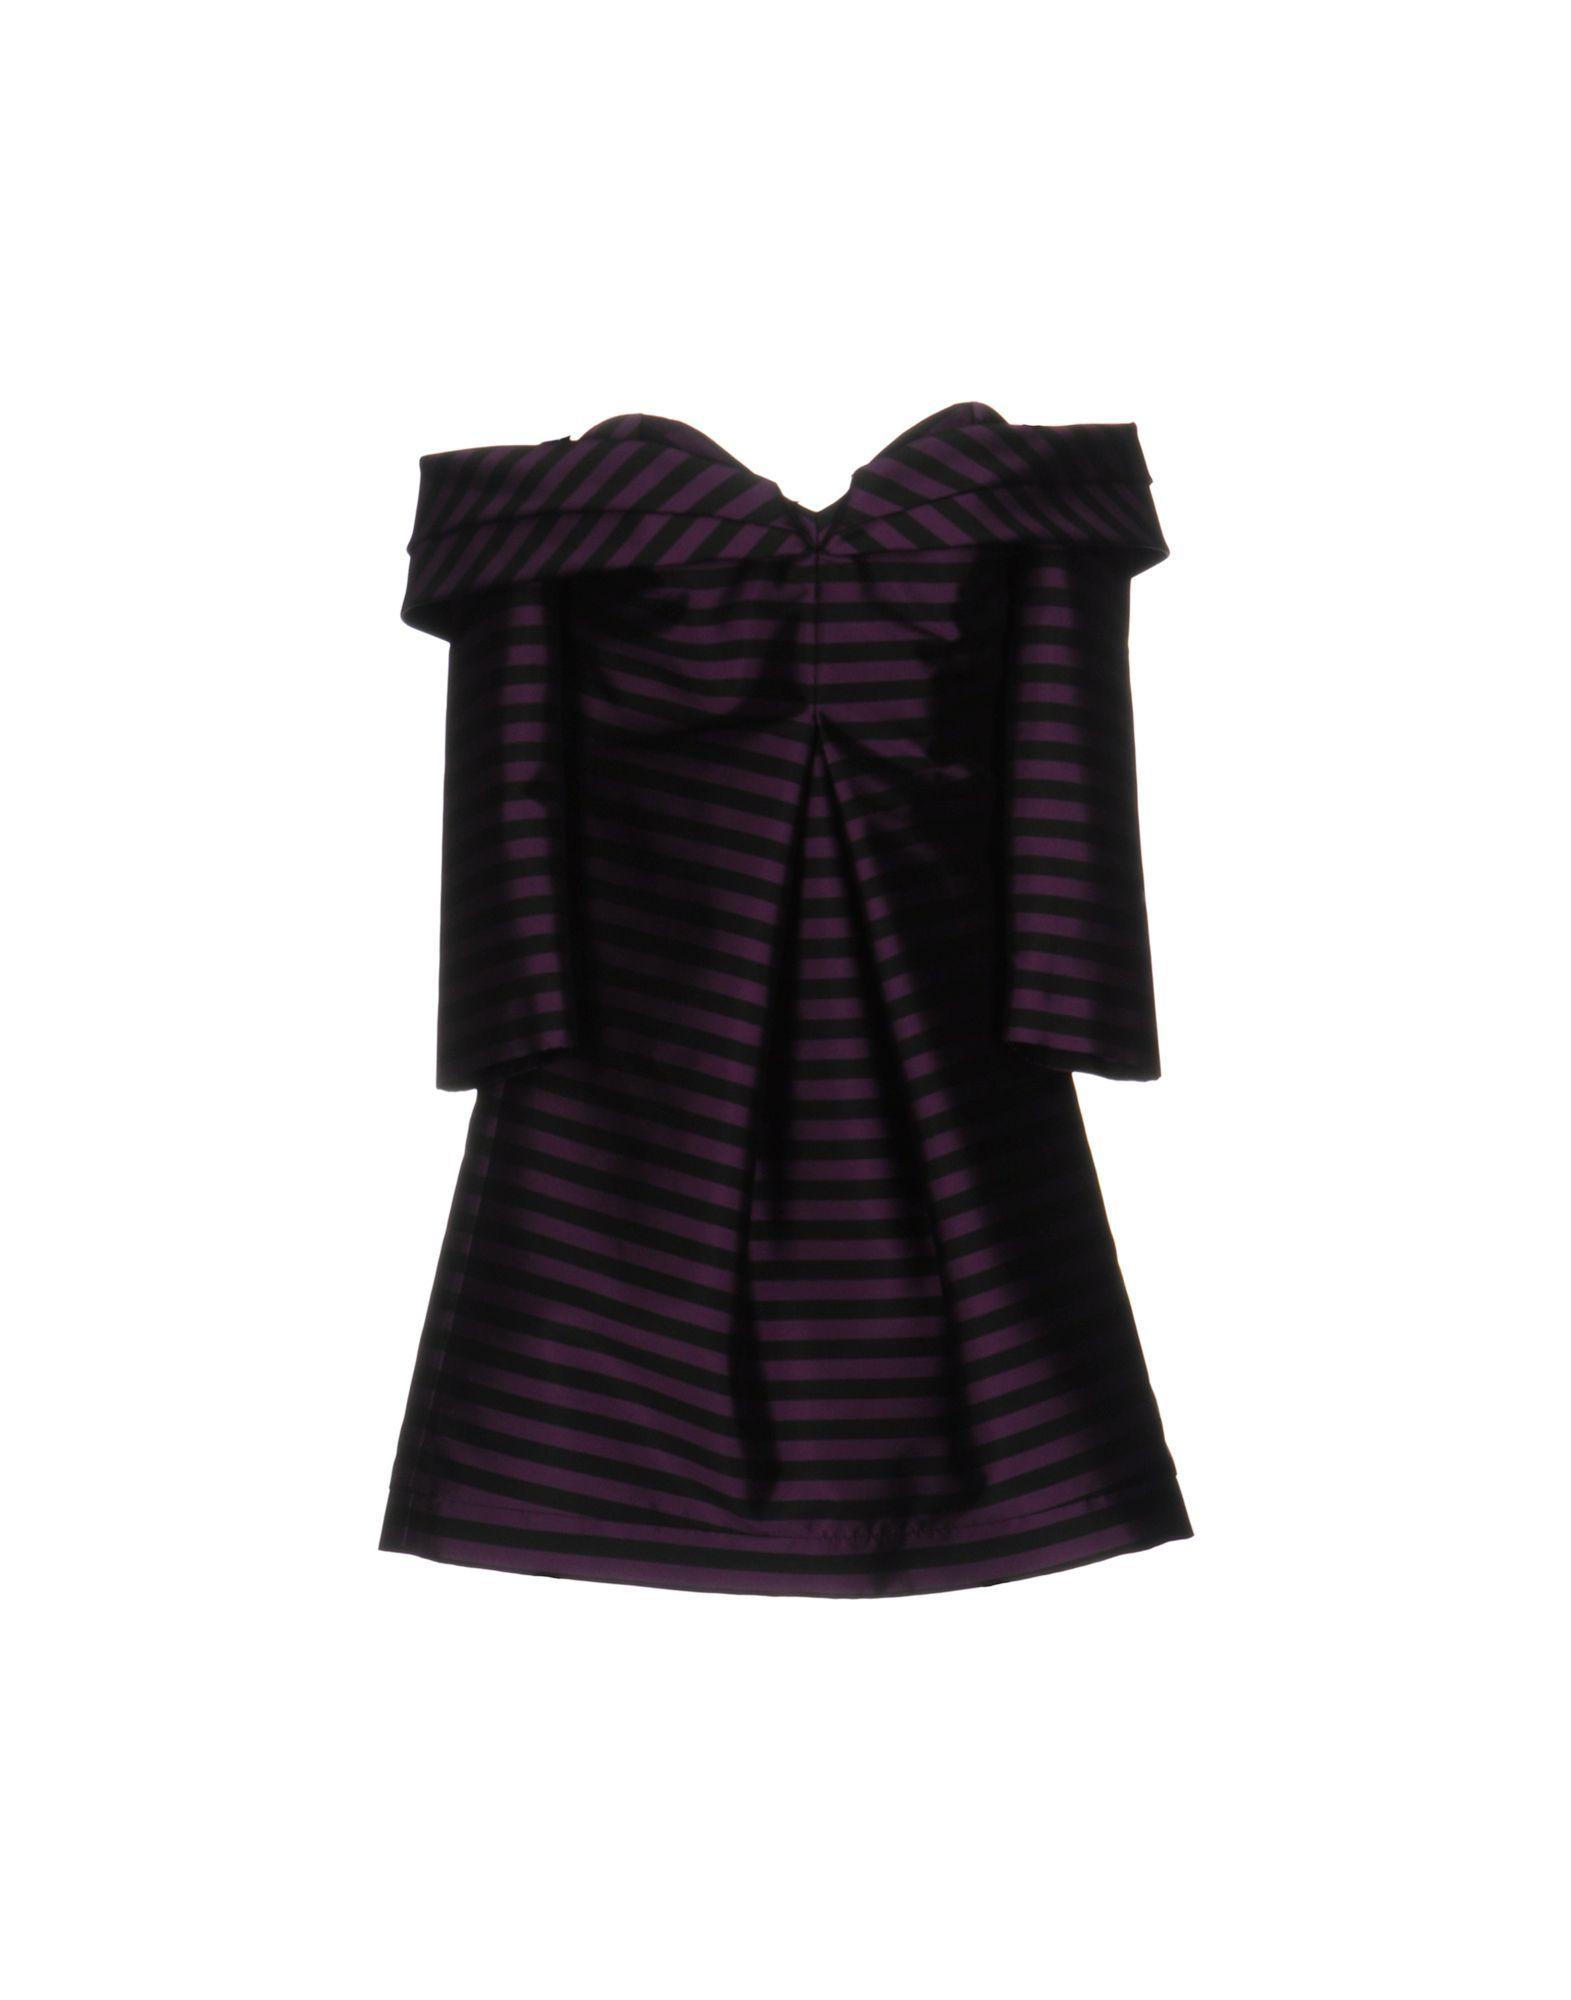 Mangano Purple Satin Off The Shoulder Dress